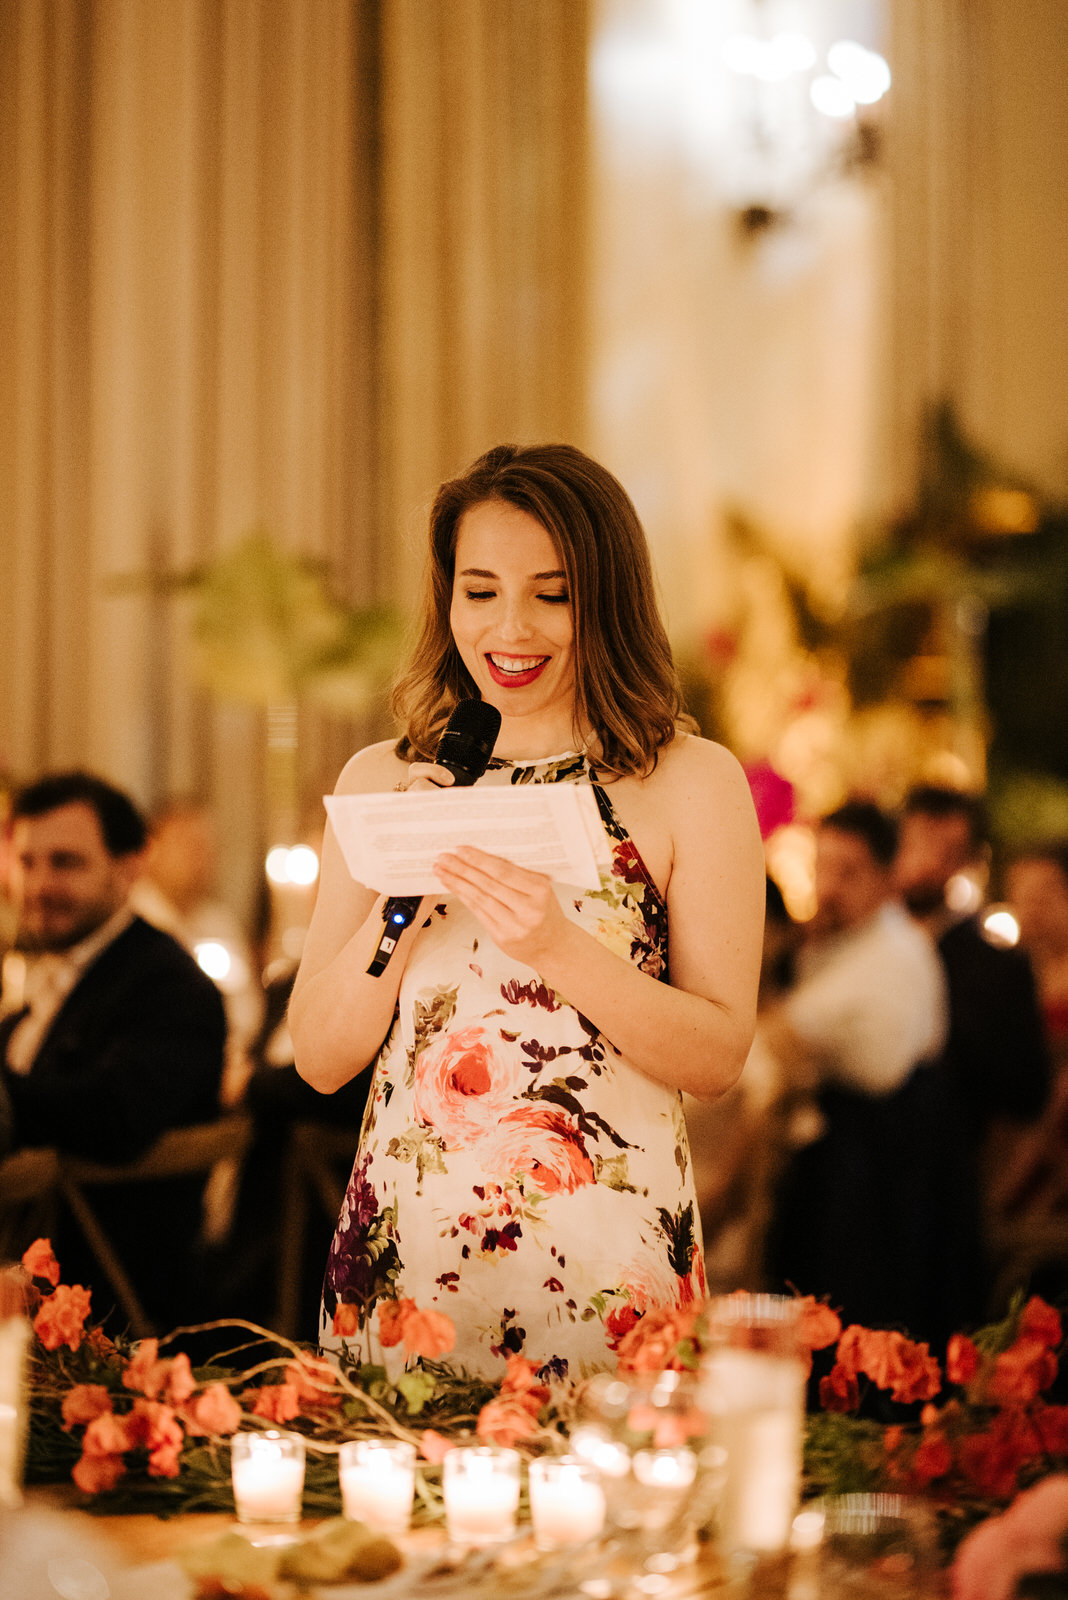 Groom's sister reads her wedding speech